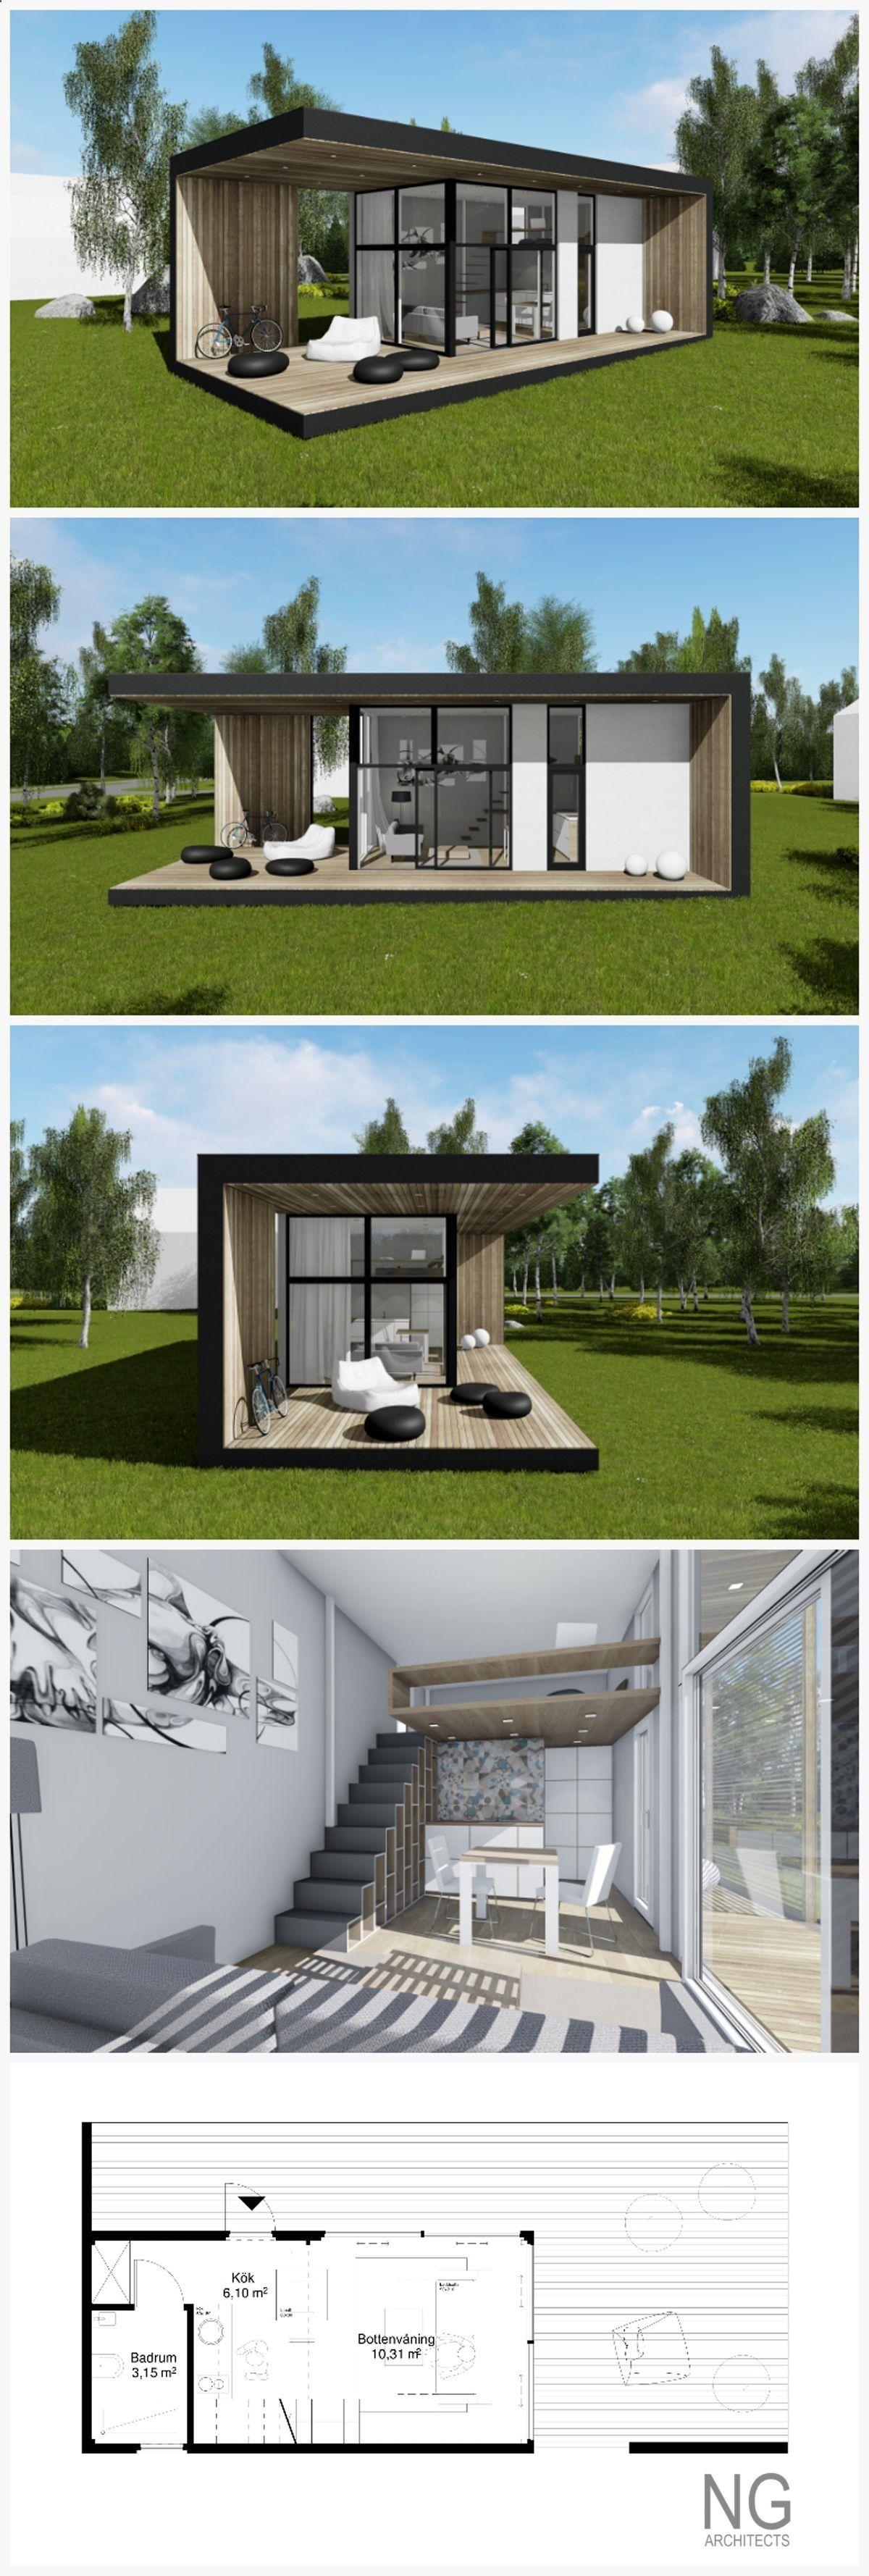 Container House Pacific 25 m small house attafallshus designed